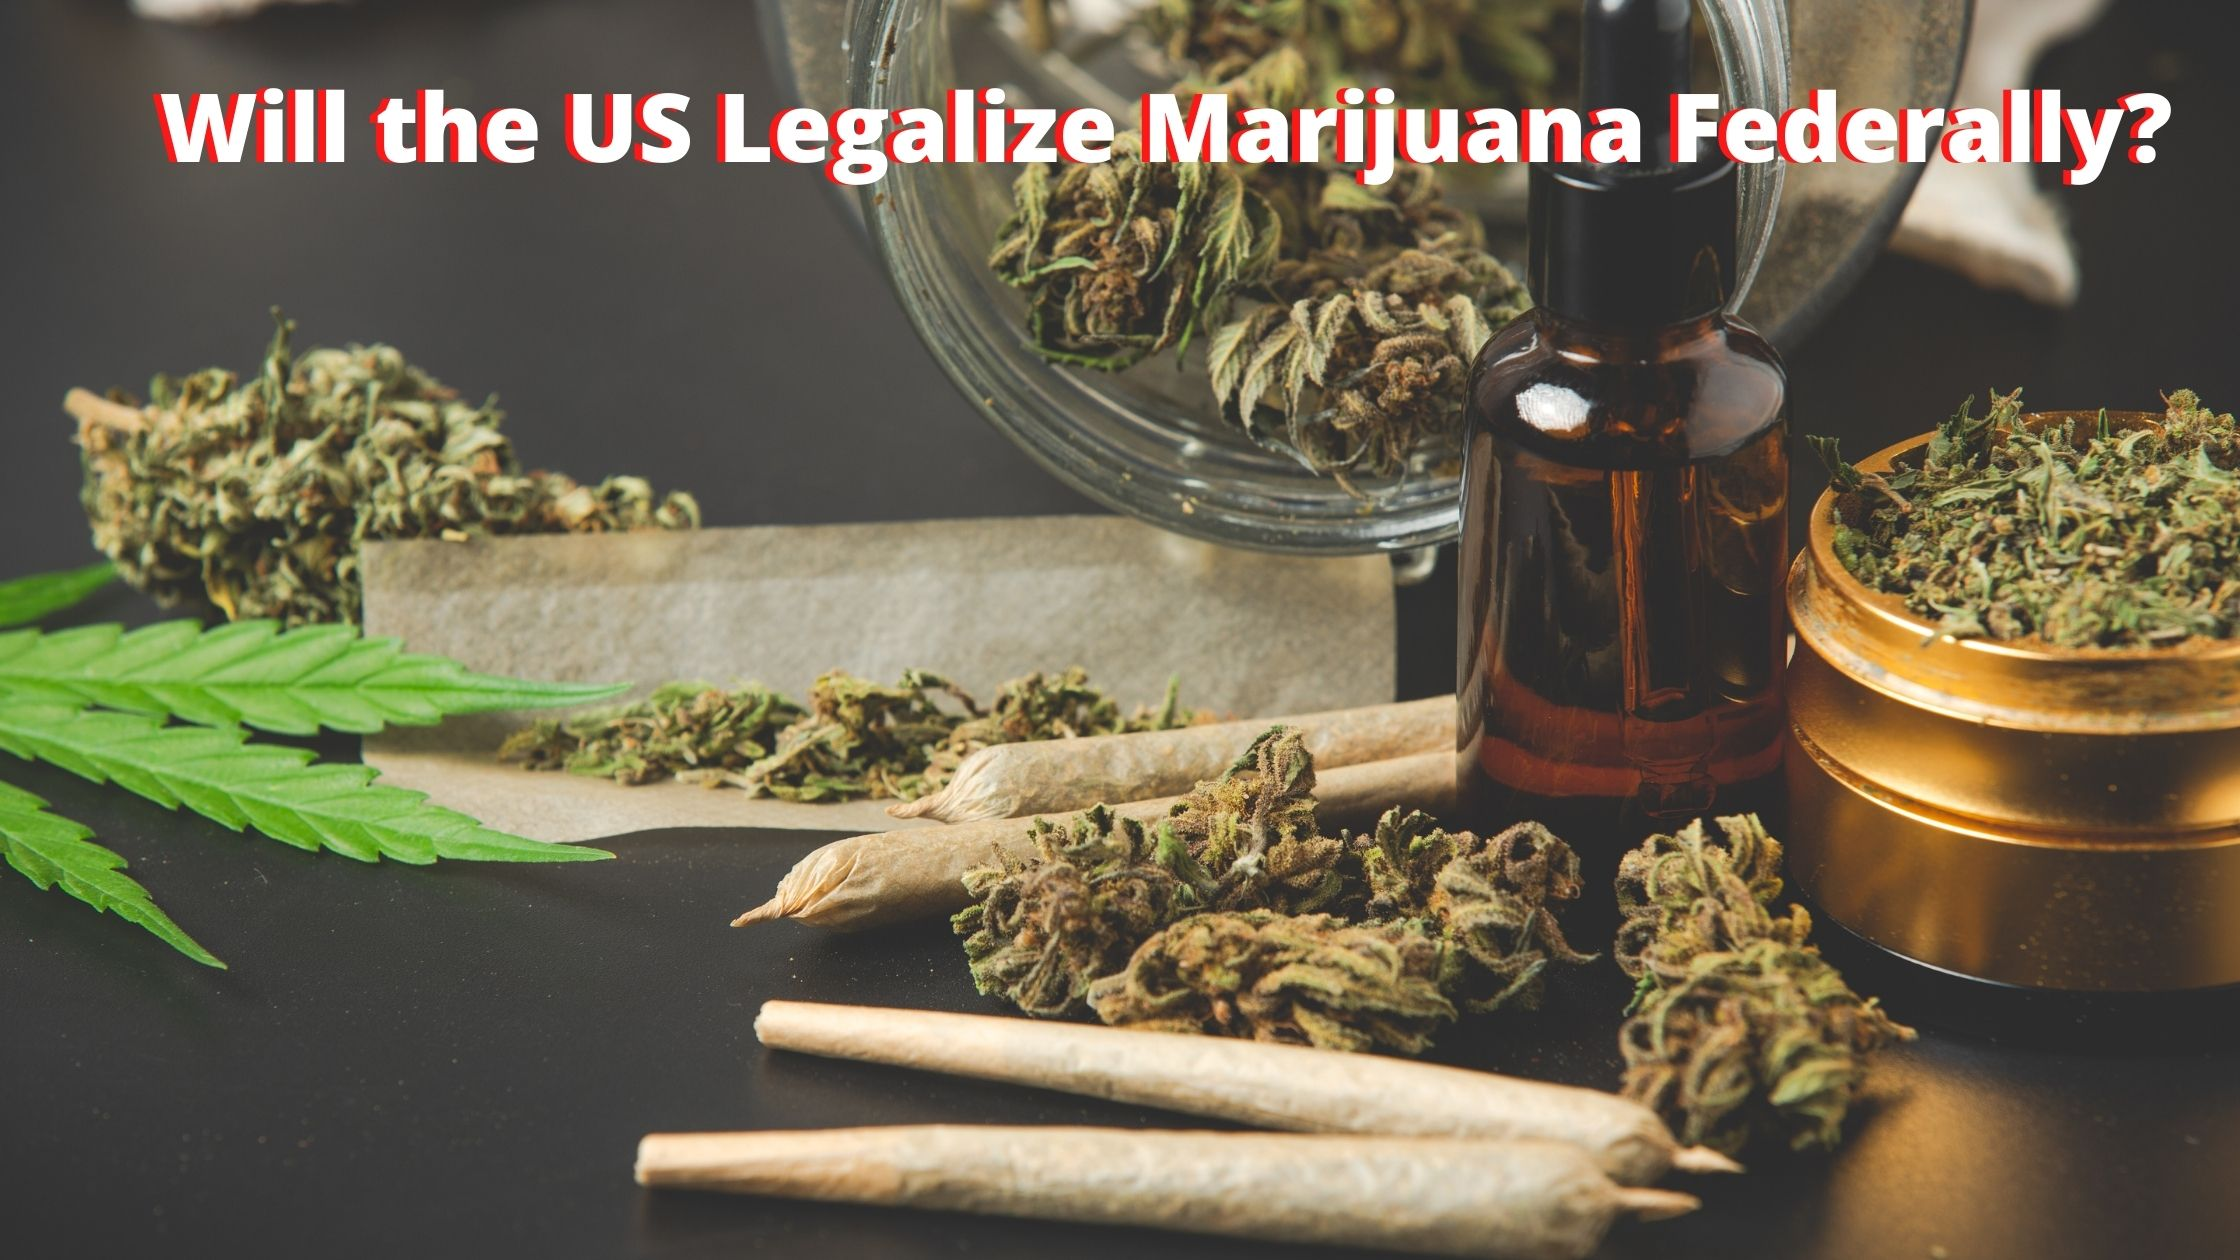 Will the US Legalize Marijuana Federally